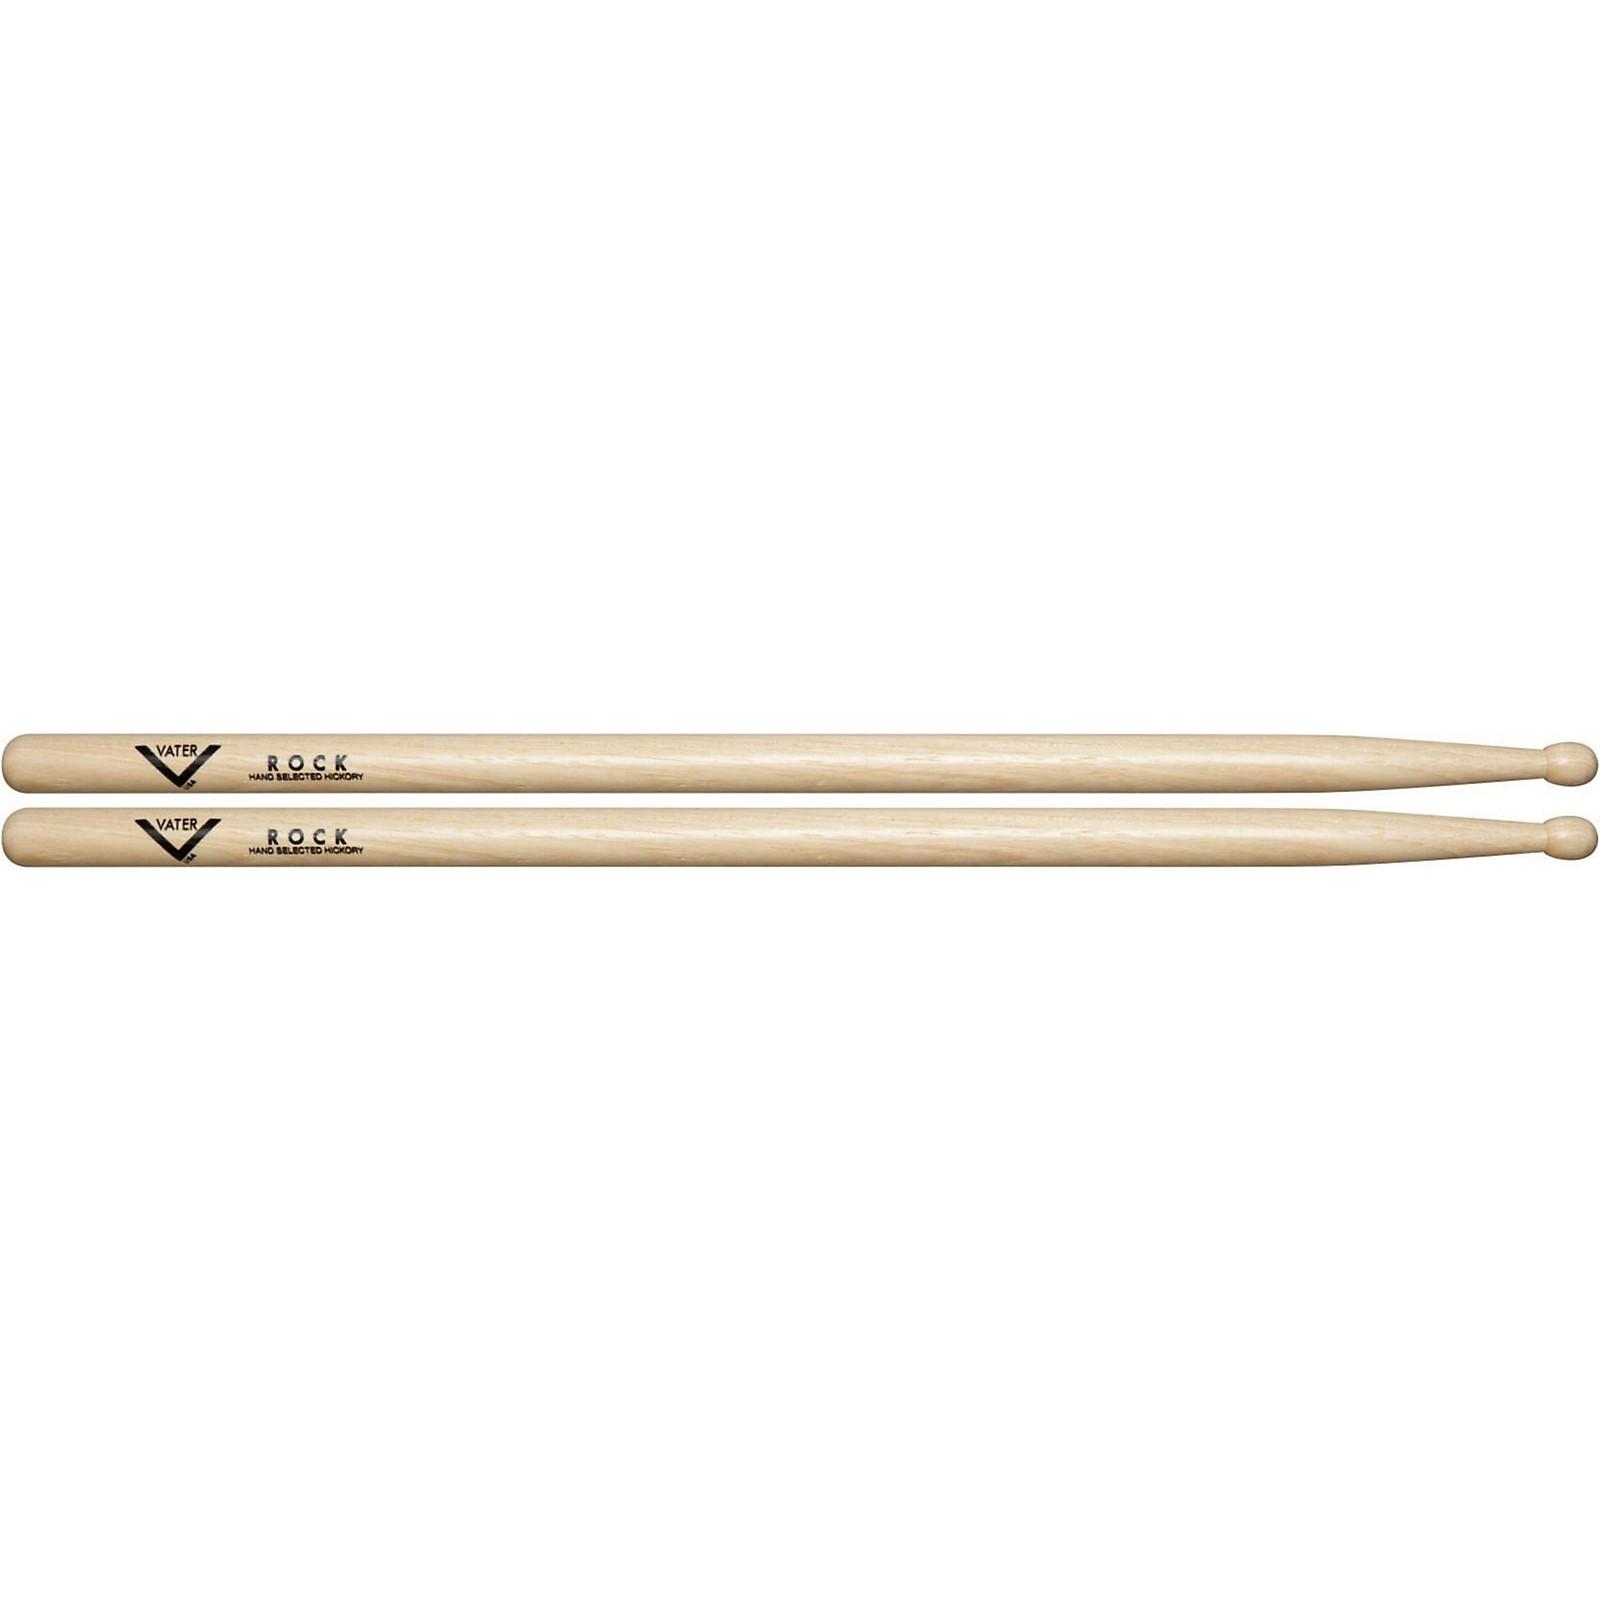 Vater American Hickory Rock Drumsticks